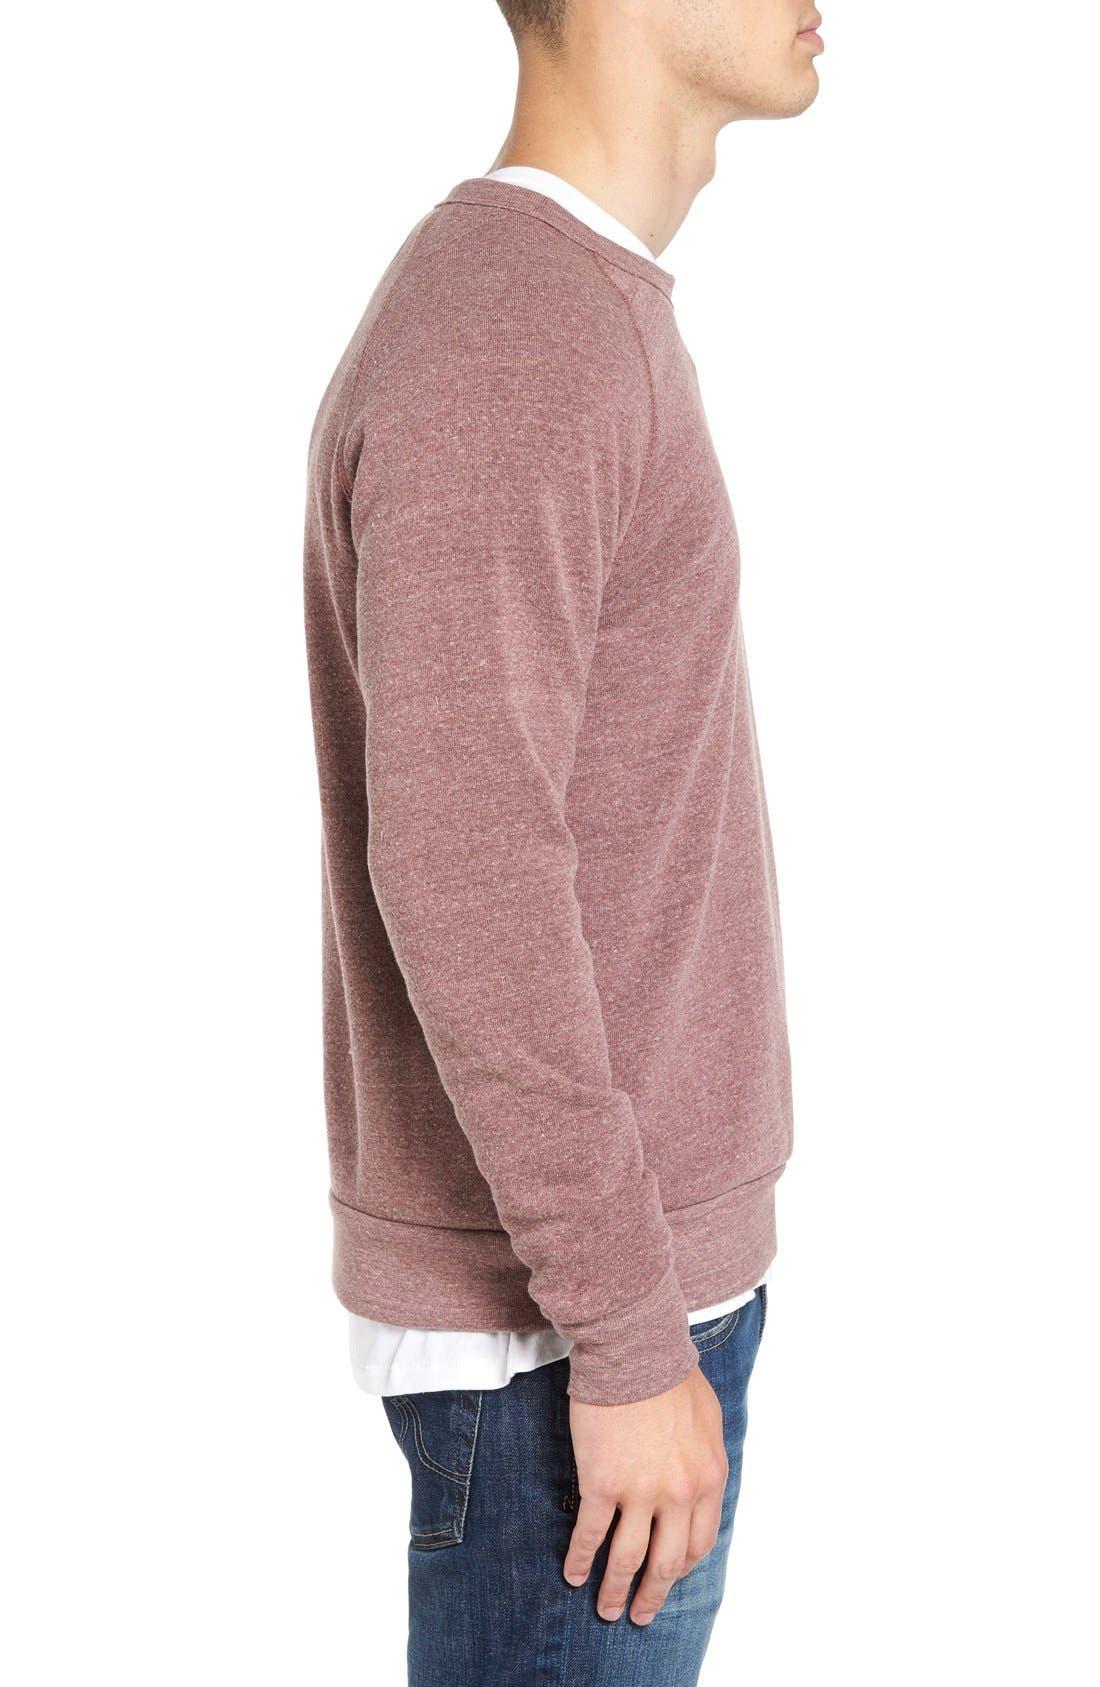 'The Champ' Sweatshirt,                             Alternate thumbnail 37, color,